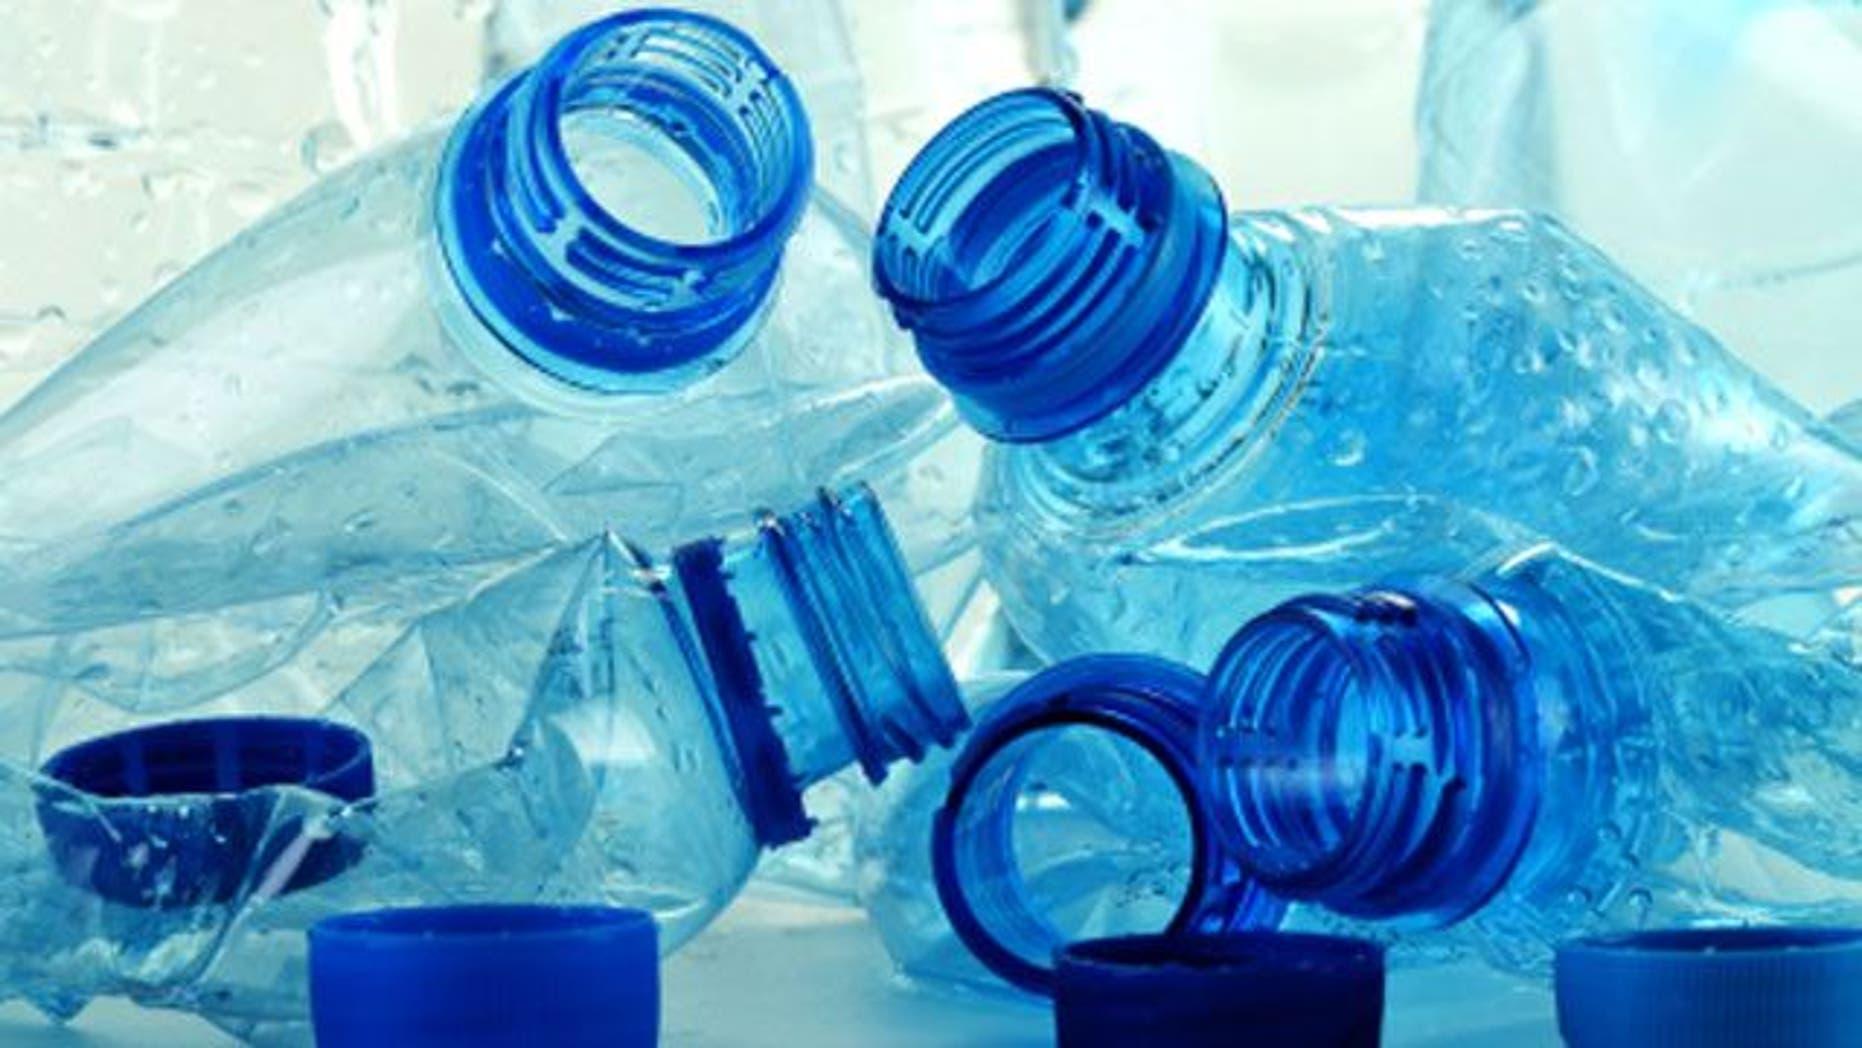 Is BPA-free plastic safe? | Fox News